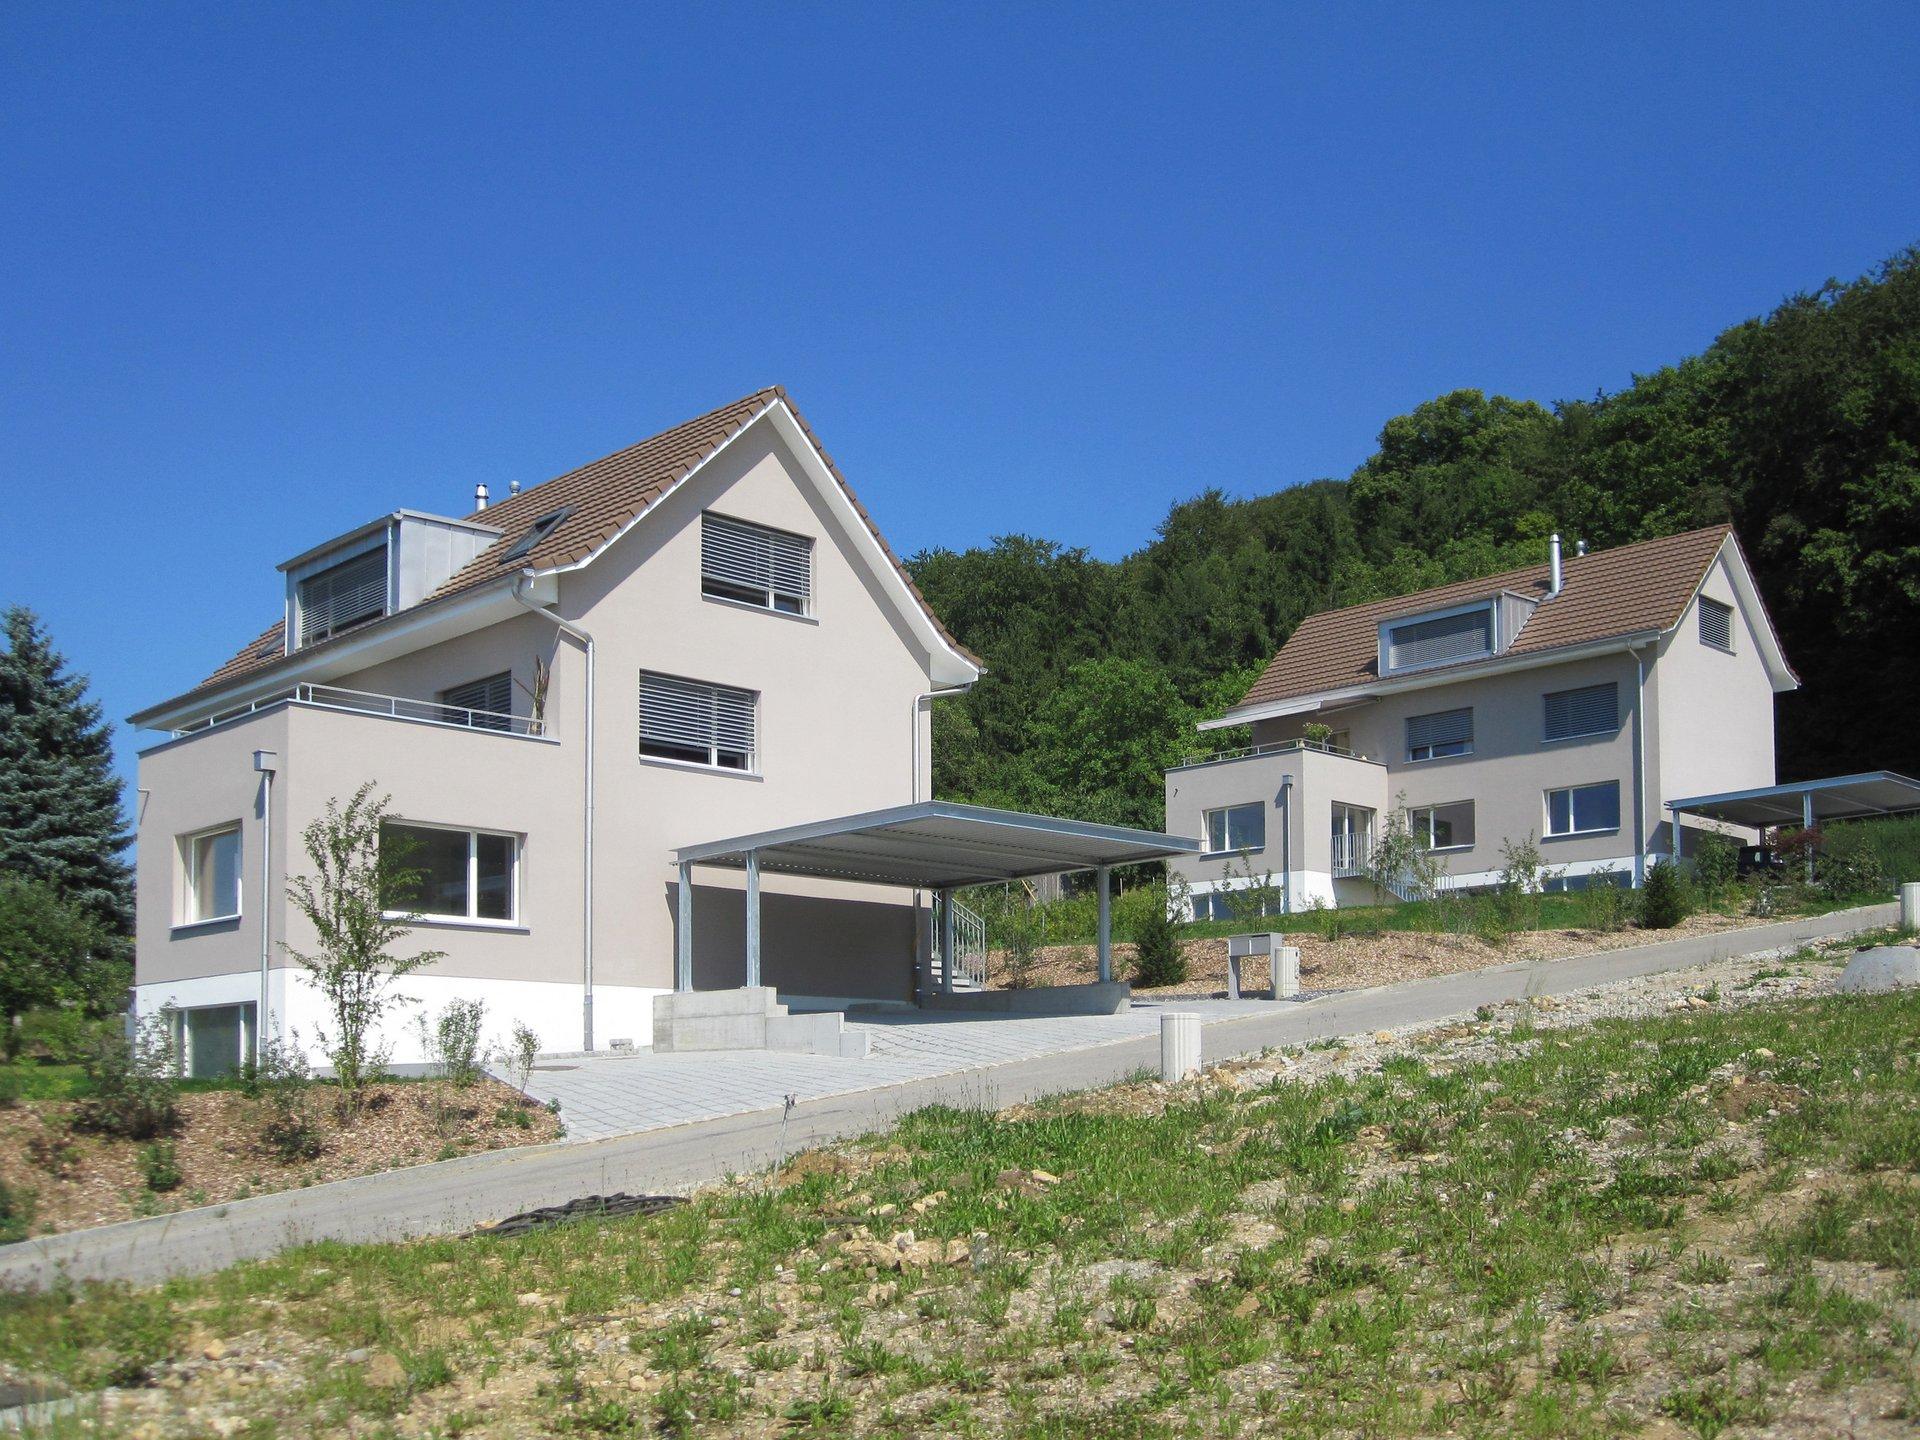 2 freistehende Doppeleinfamilienhäuser